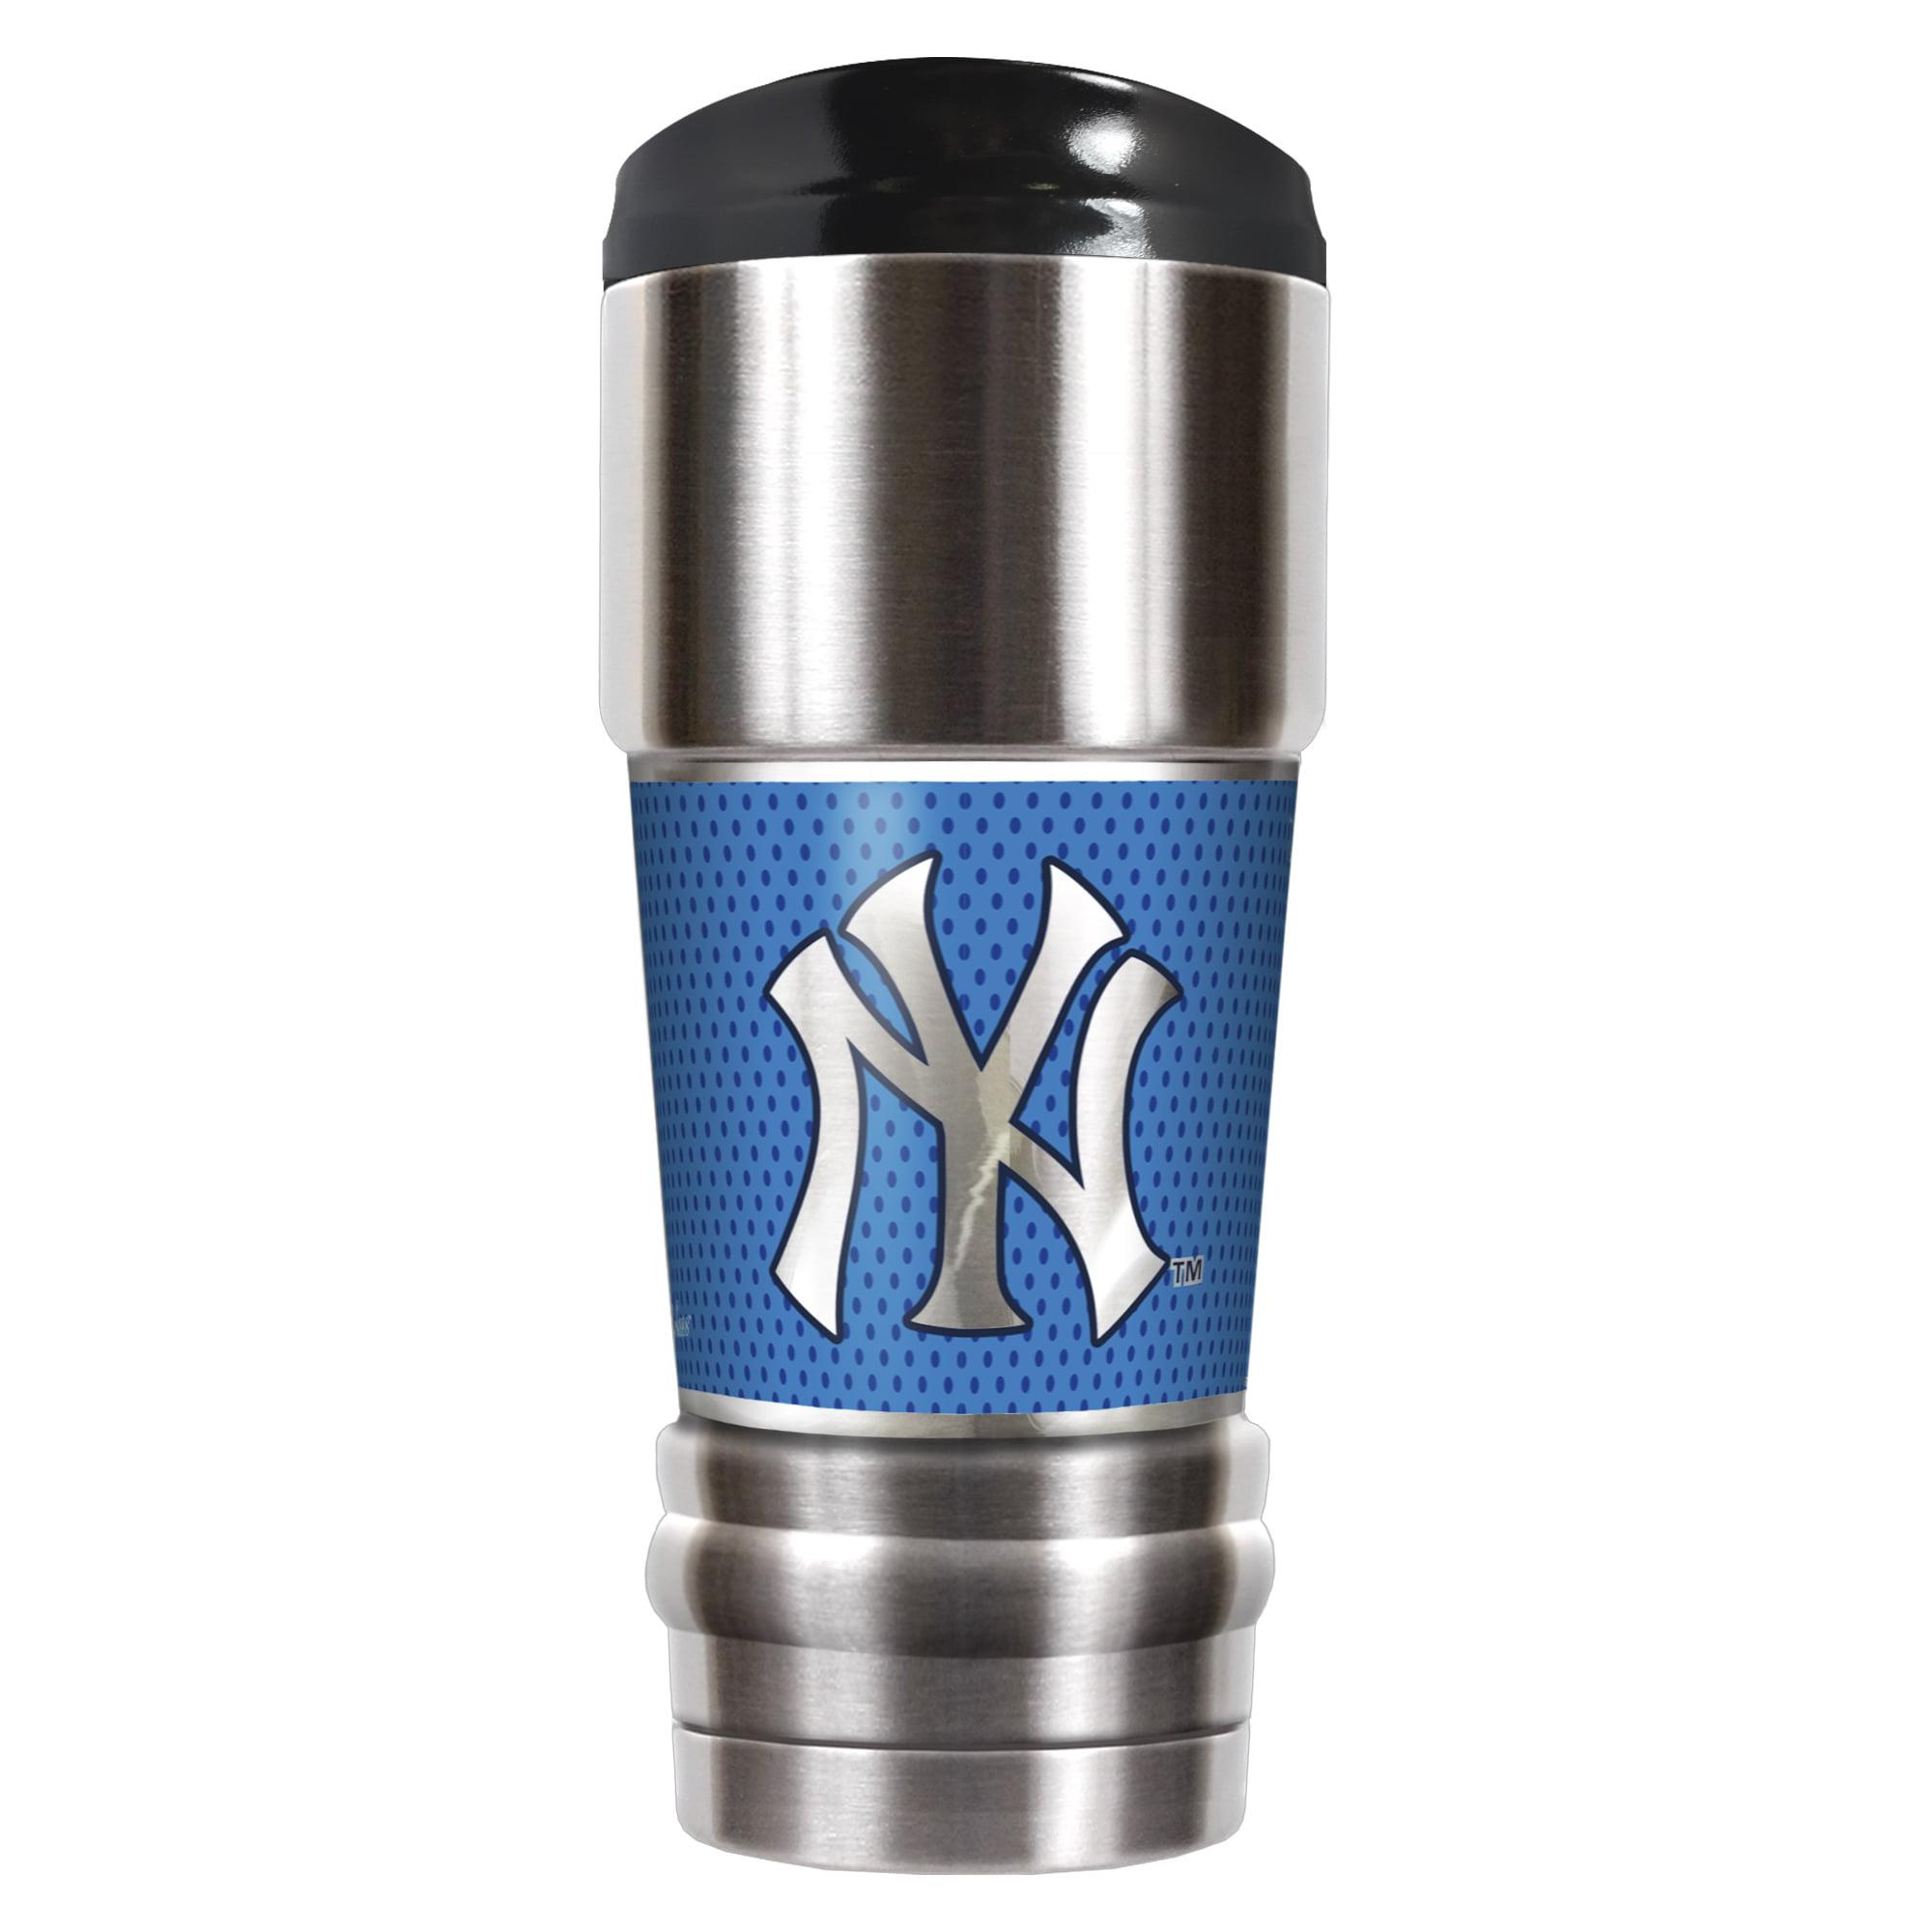 New York Yankees 2018 Players' Weekend 18oz. Vacuum-Insulated Travel Mug - No Size